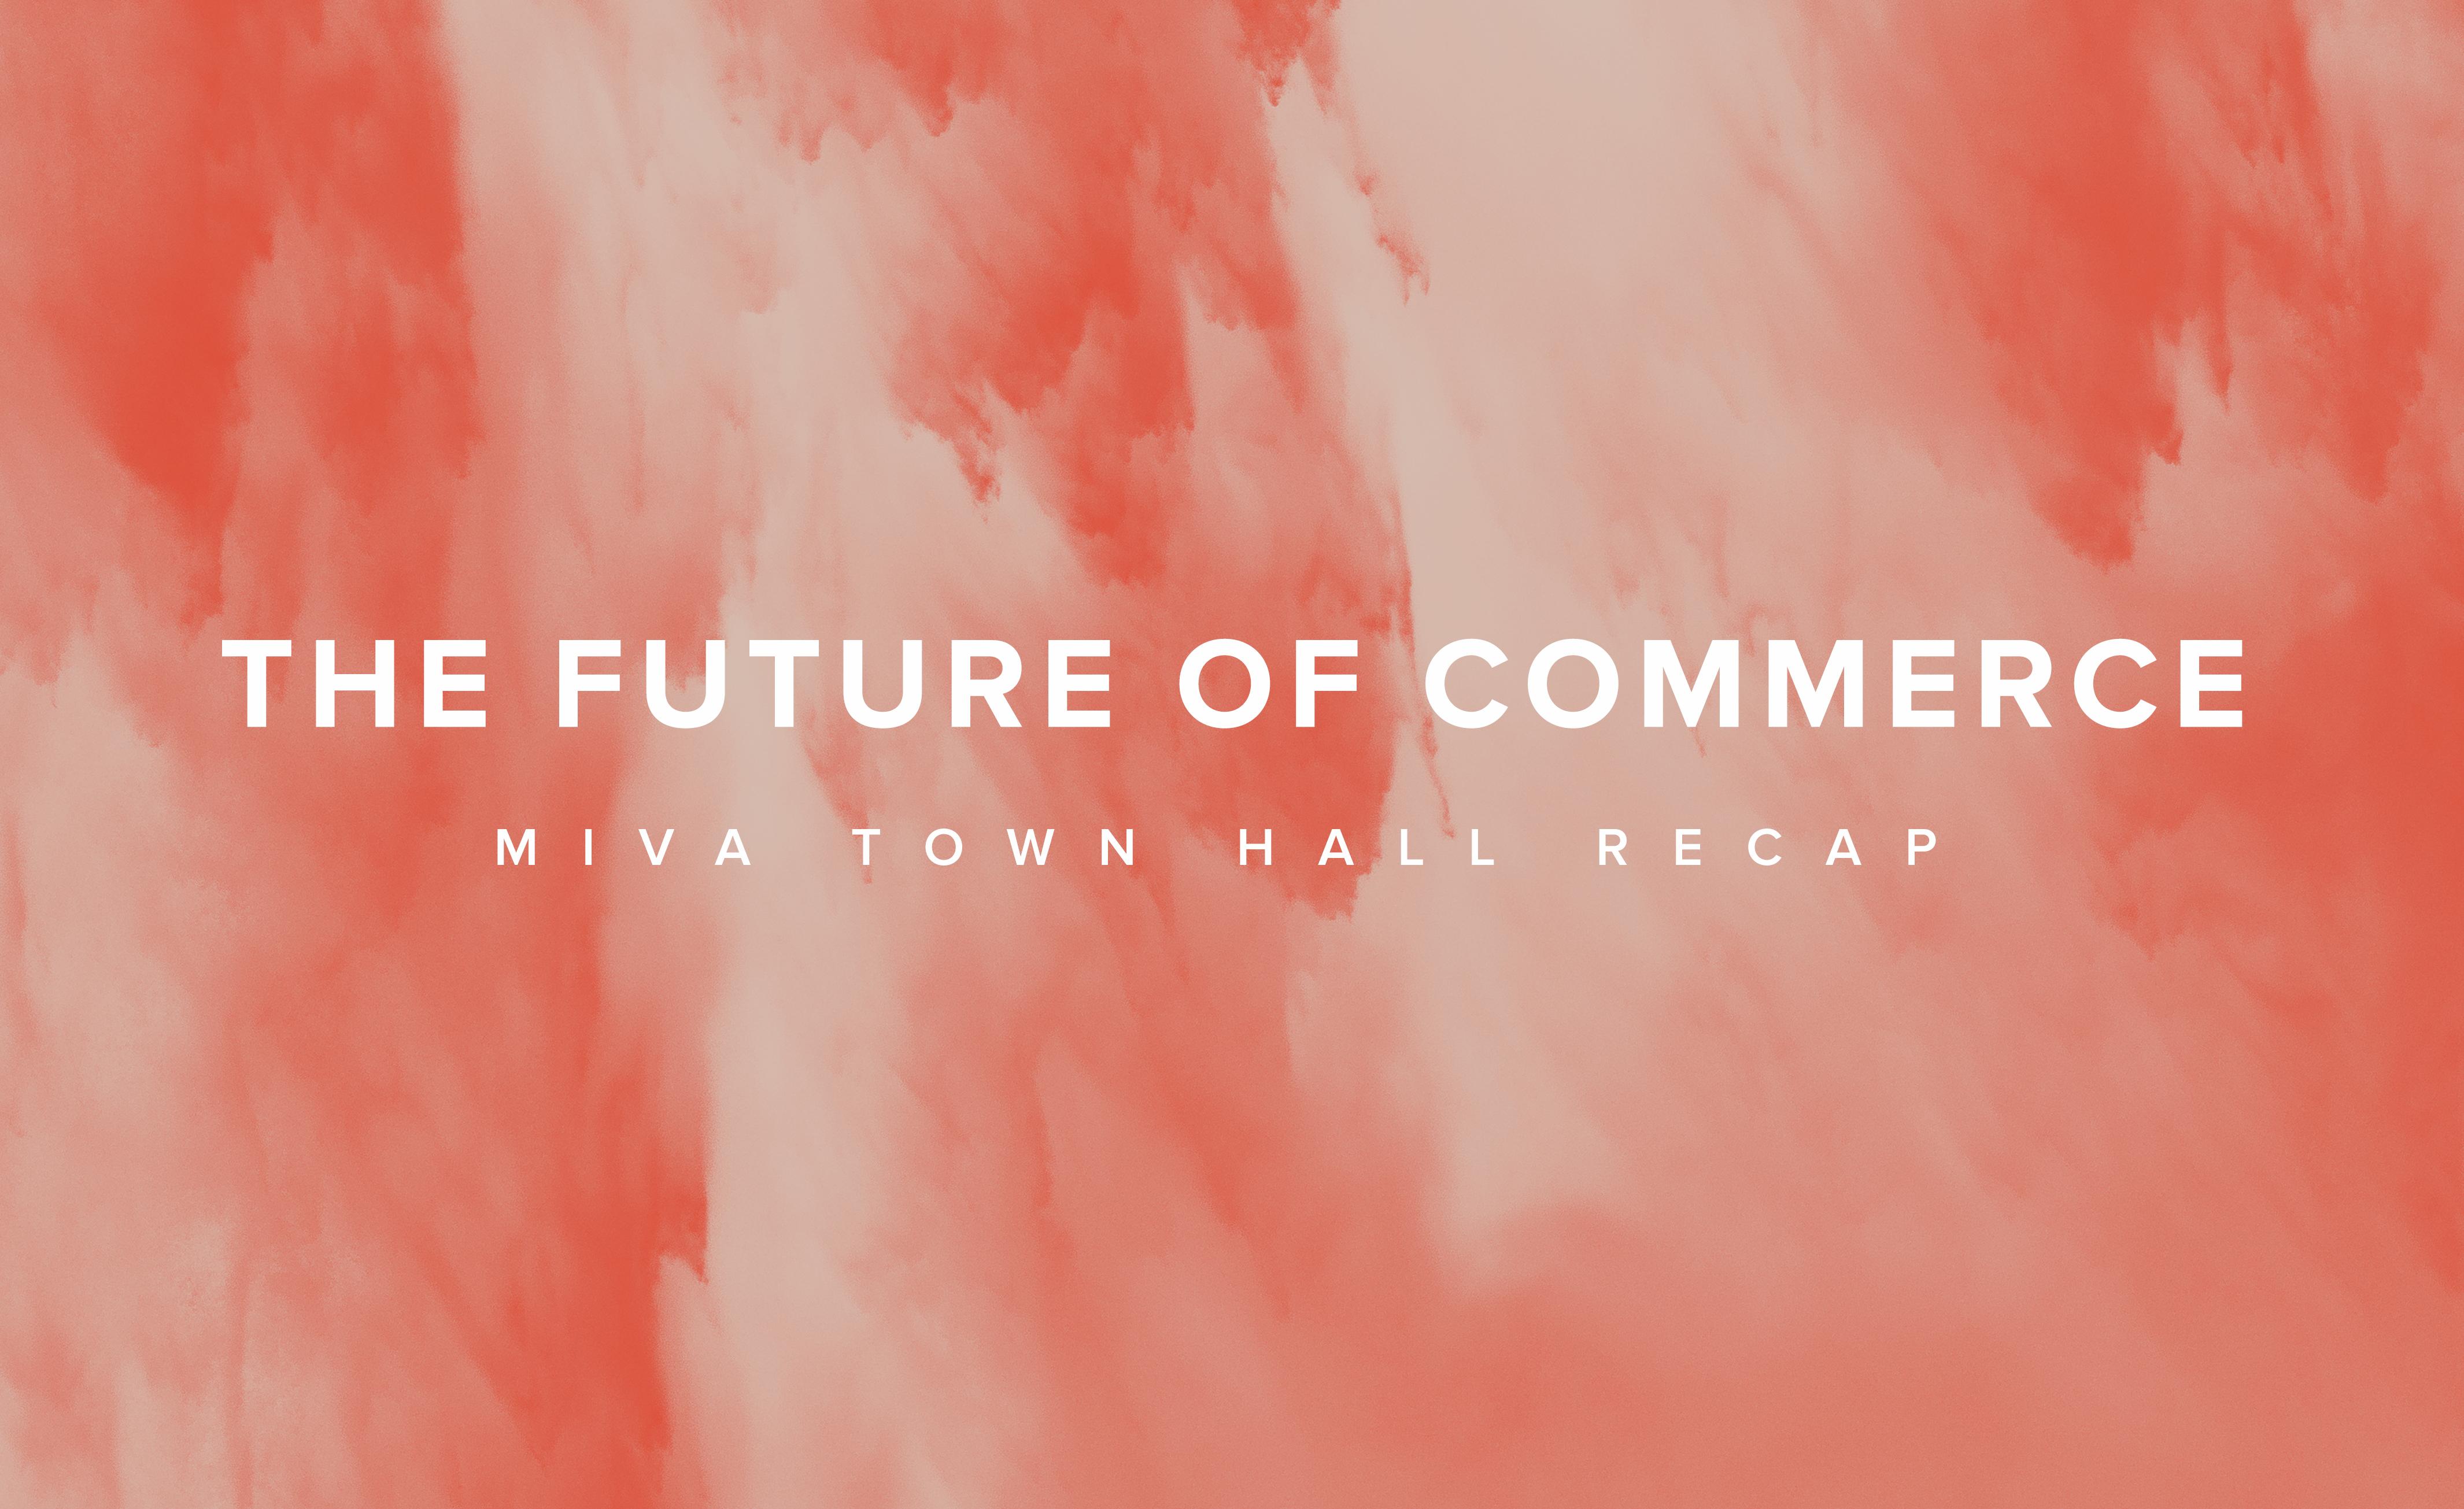 The Future of Commerce - Miva Town Hall recap.